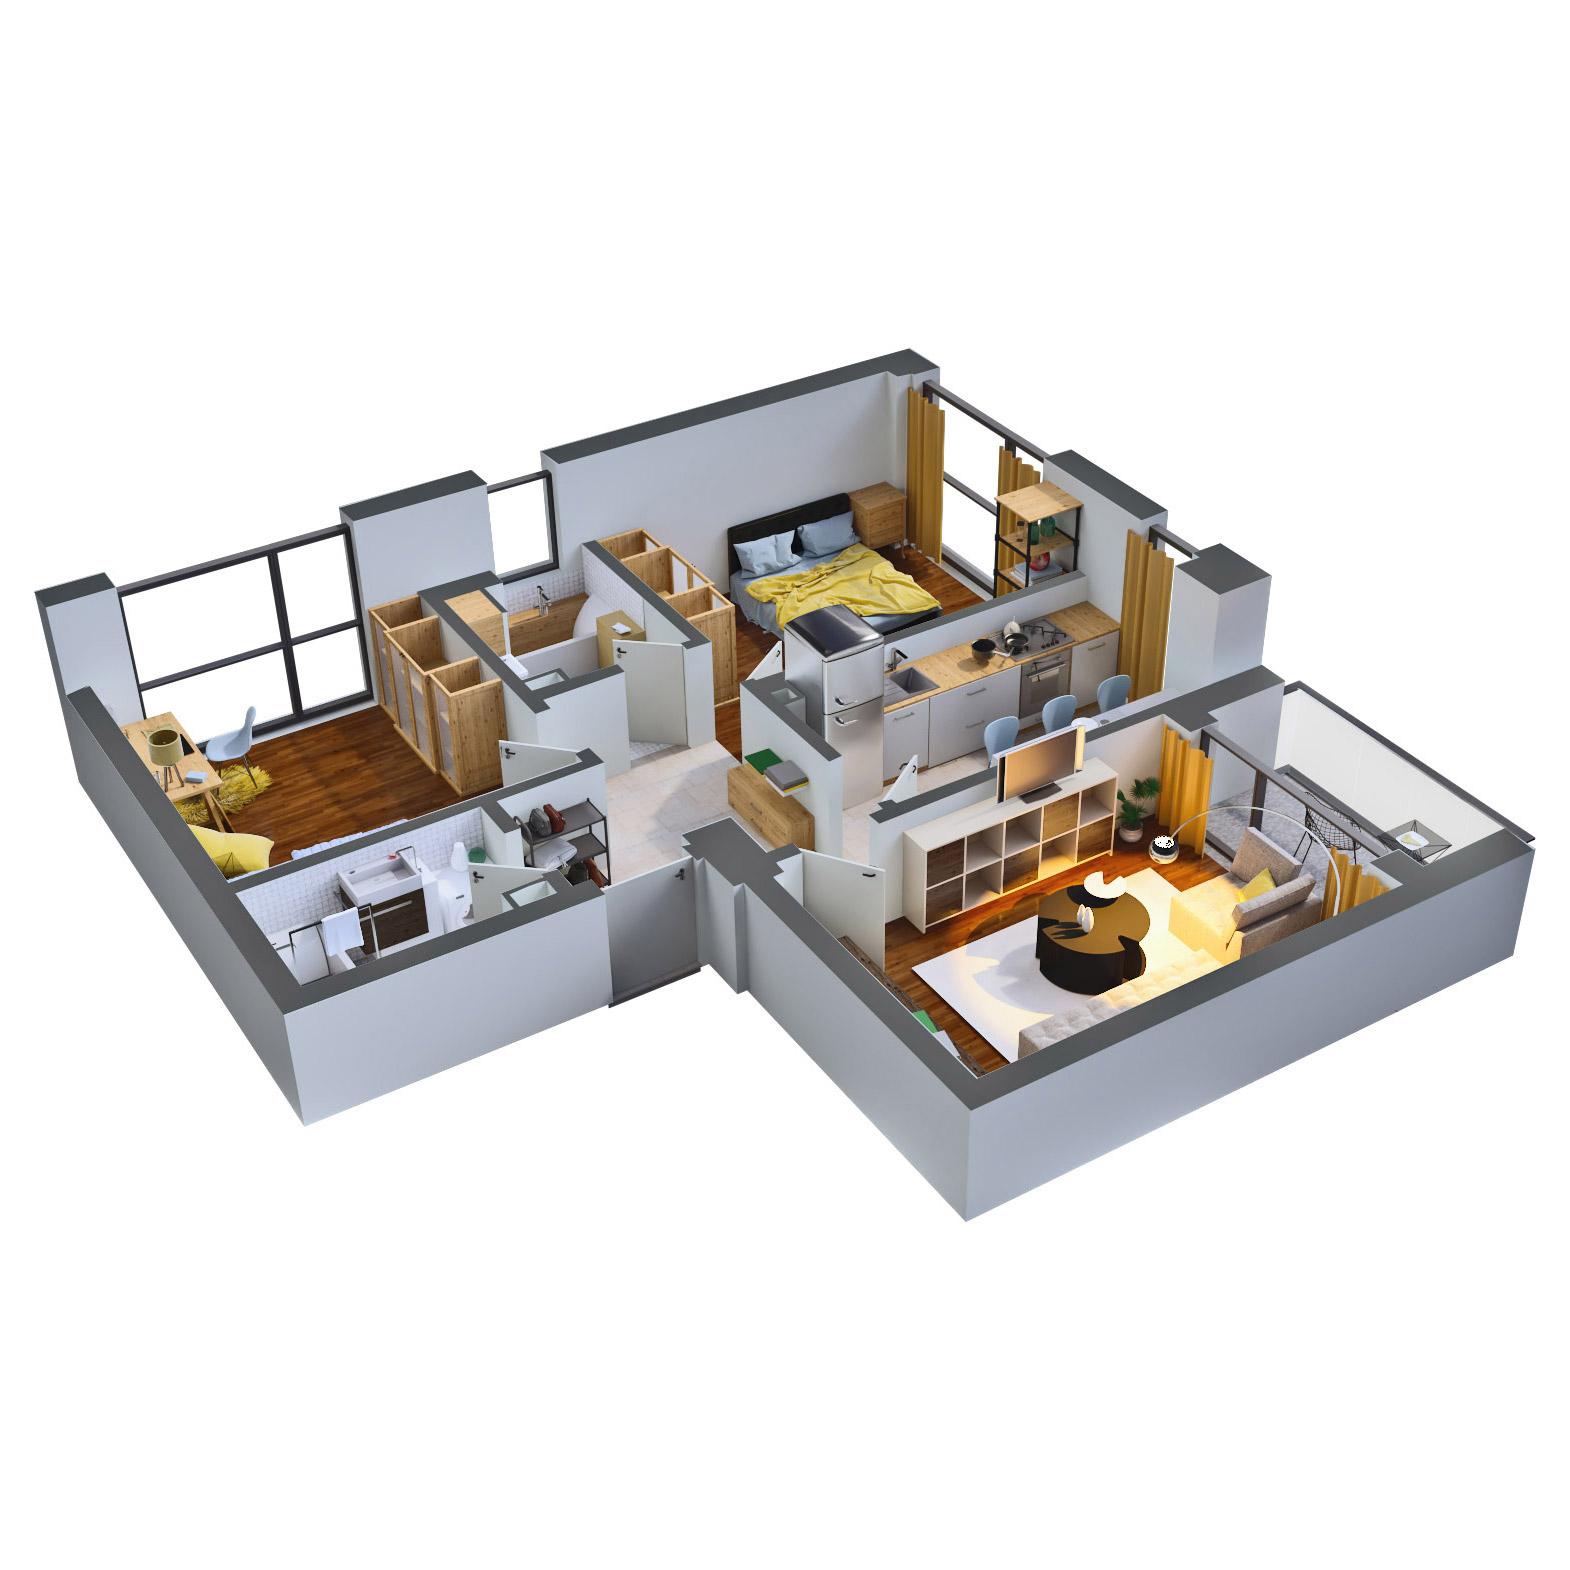 Apartament 3 camere de vanzare Bucuresti - Catedral Residence - Marriott, Piata Unirii, 13 Septembrie, Izvor - Tip 1 - T2A - D